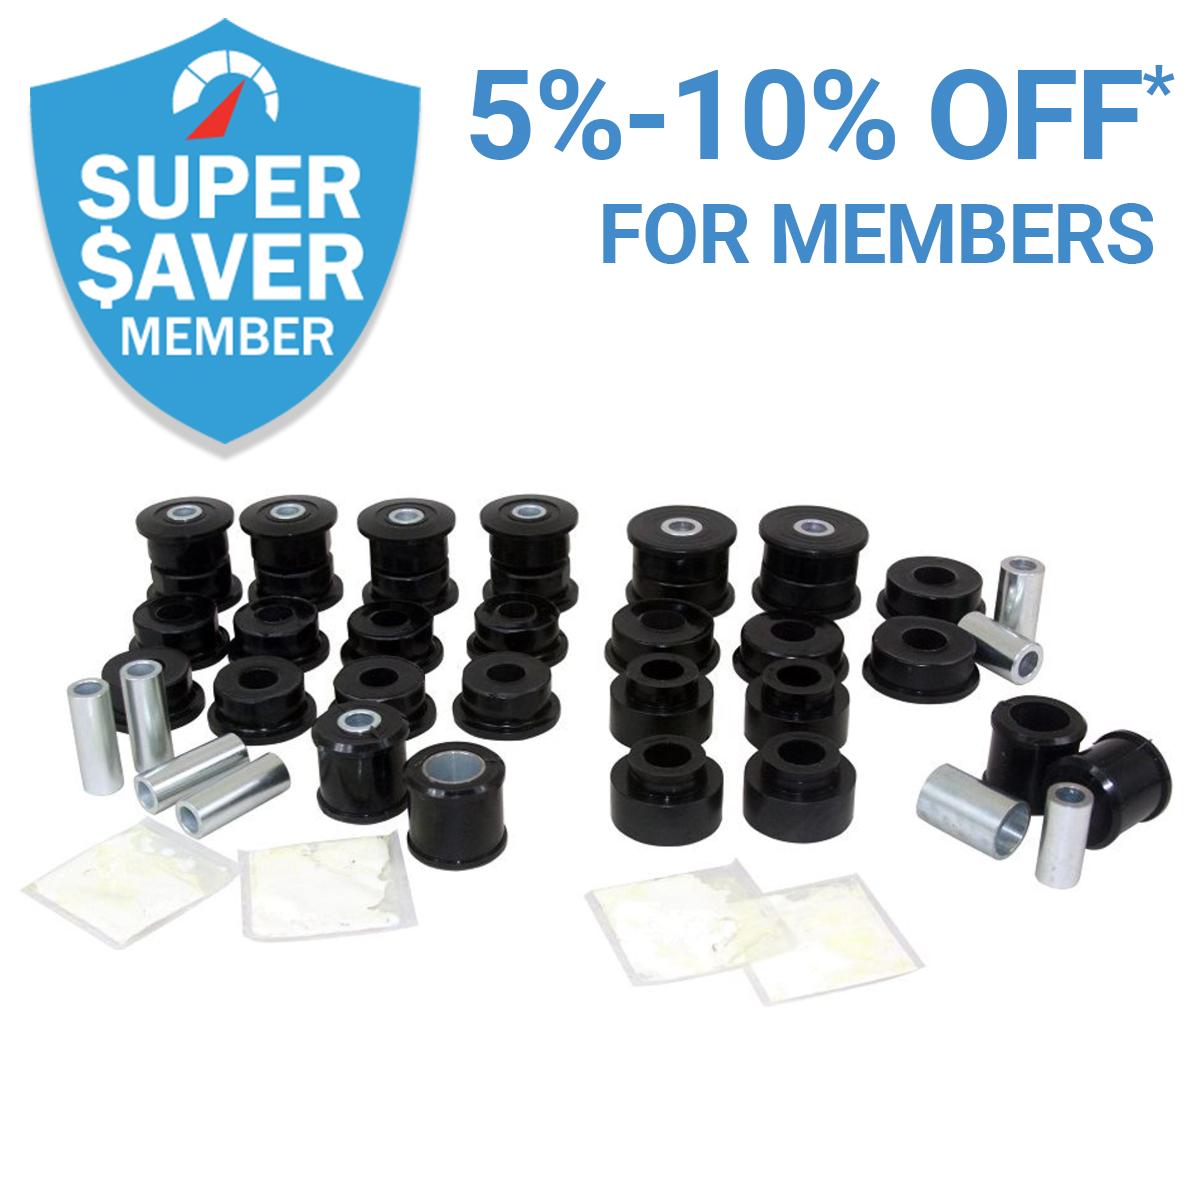 Get 5%-10% Off* Suspension Bushings as a Member